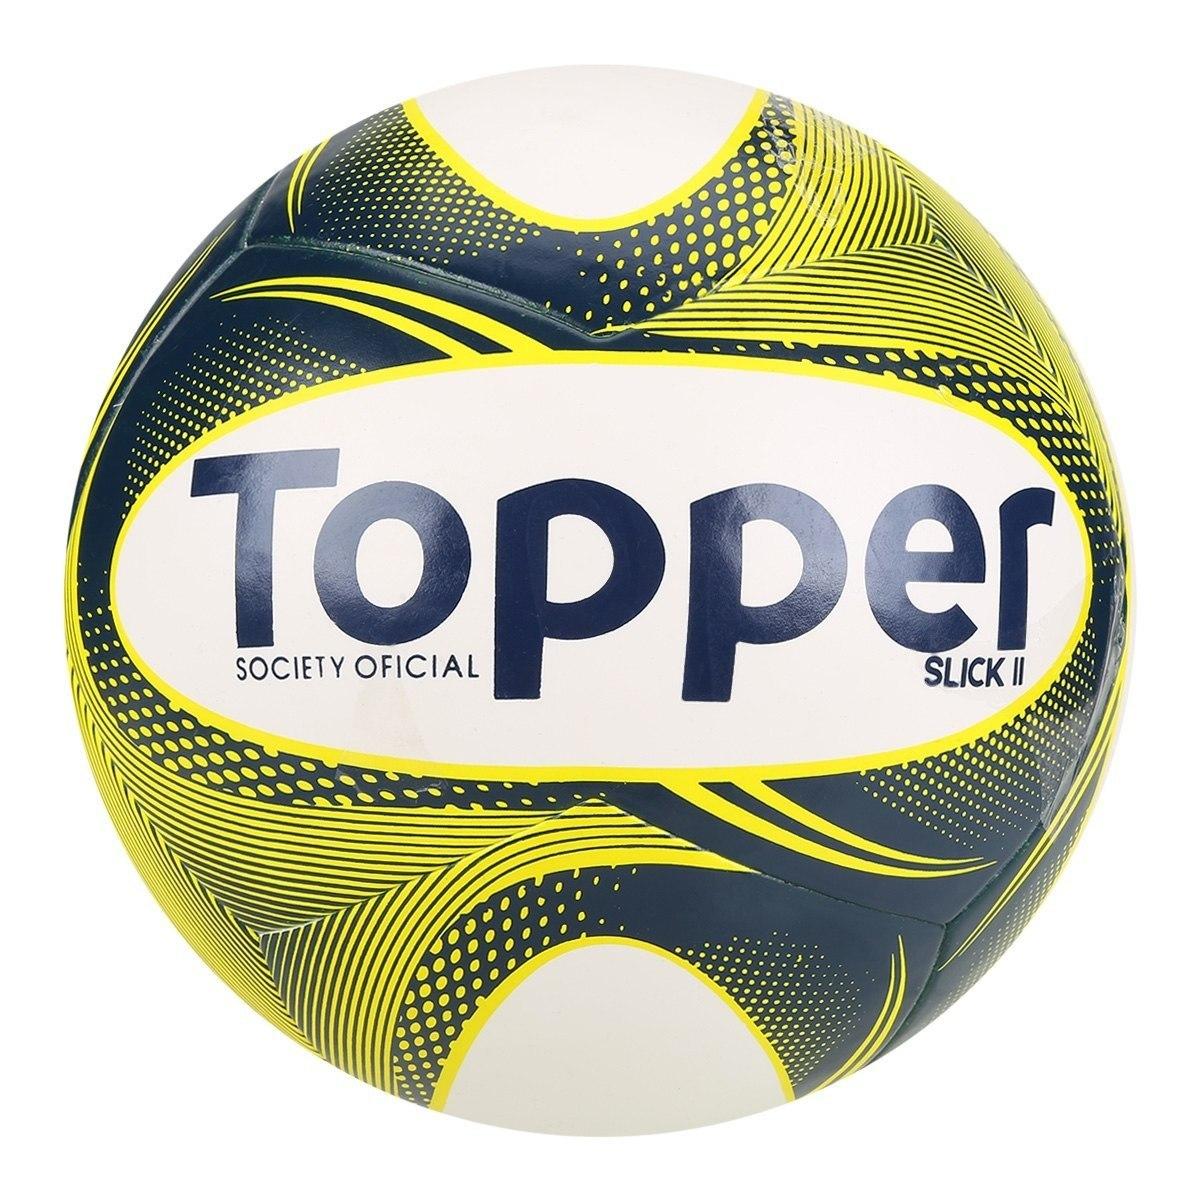 Bola Topper Slick Ii Society Cor 310 Amarela - Topper - R  39 d6541e7424fac